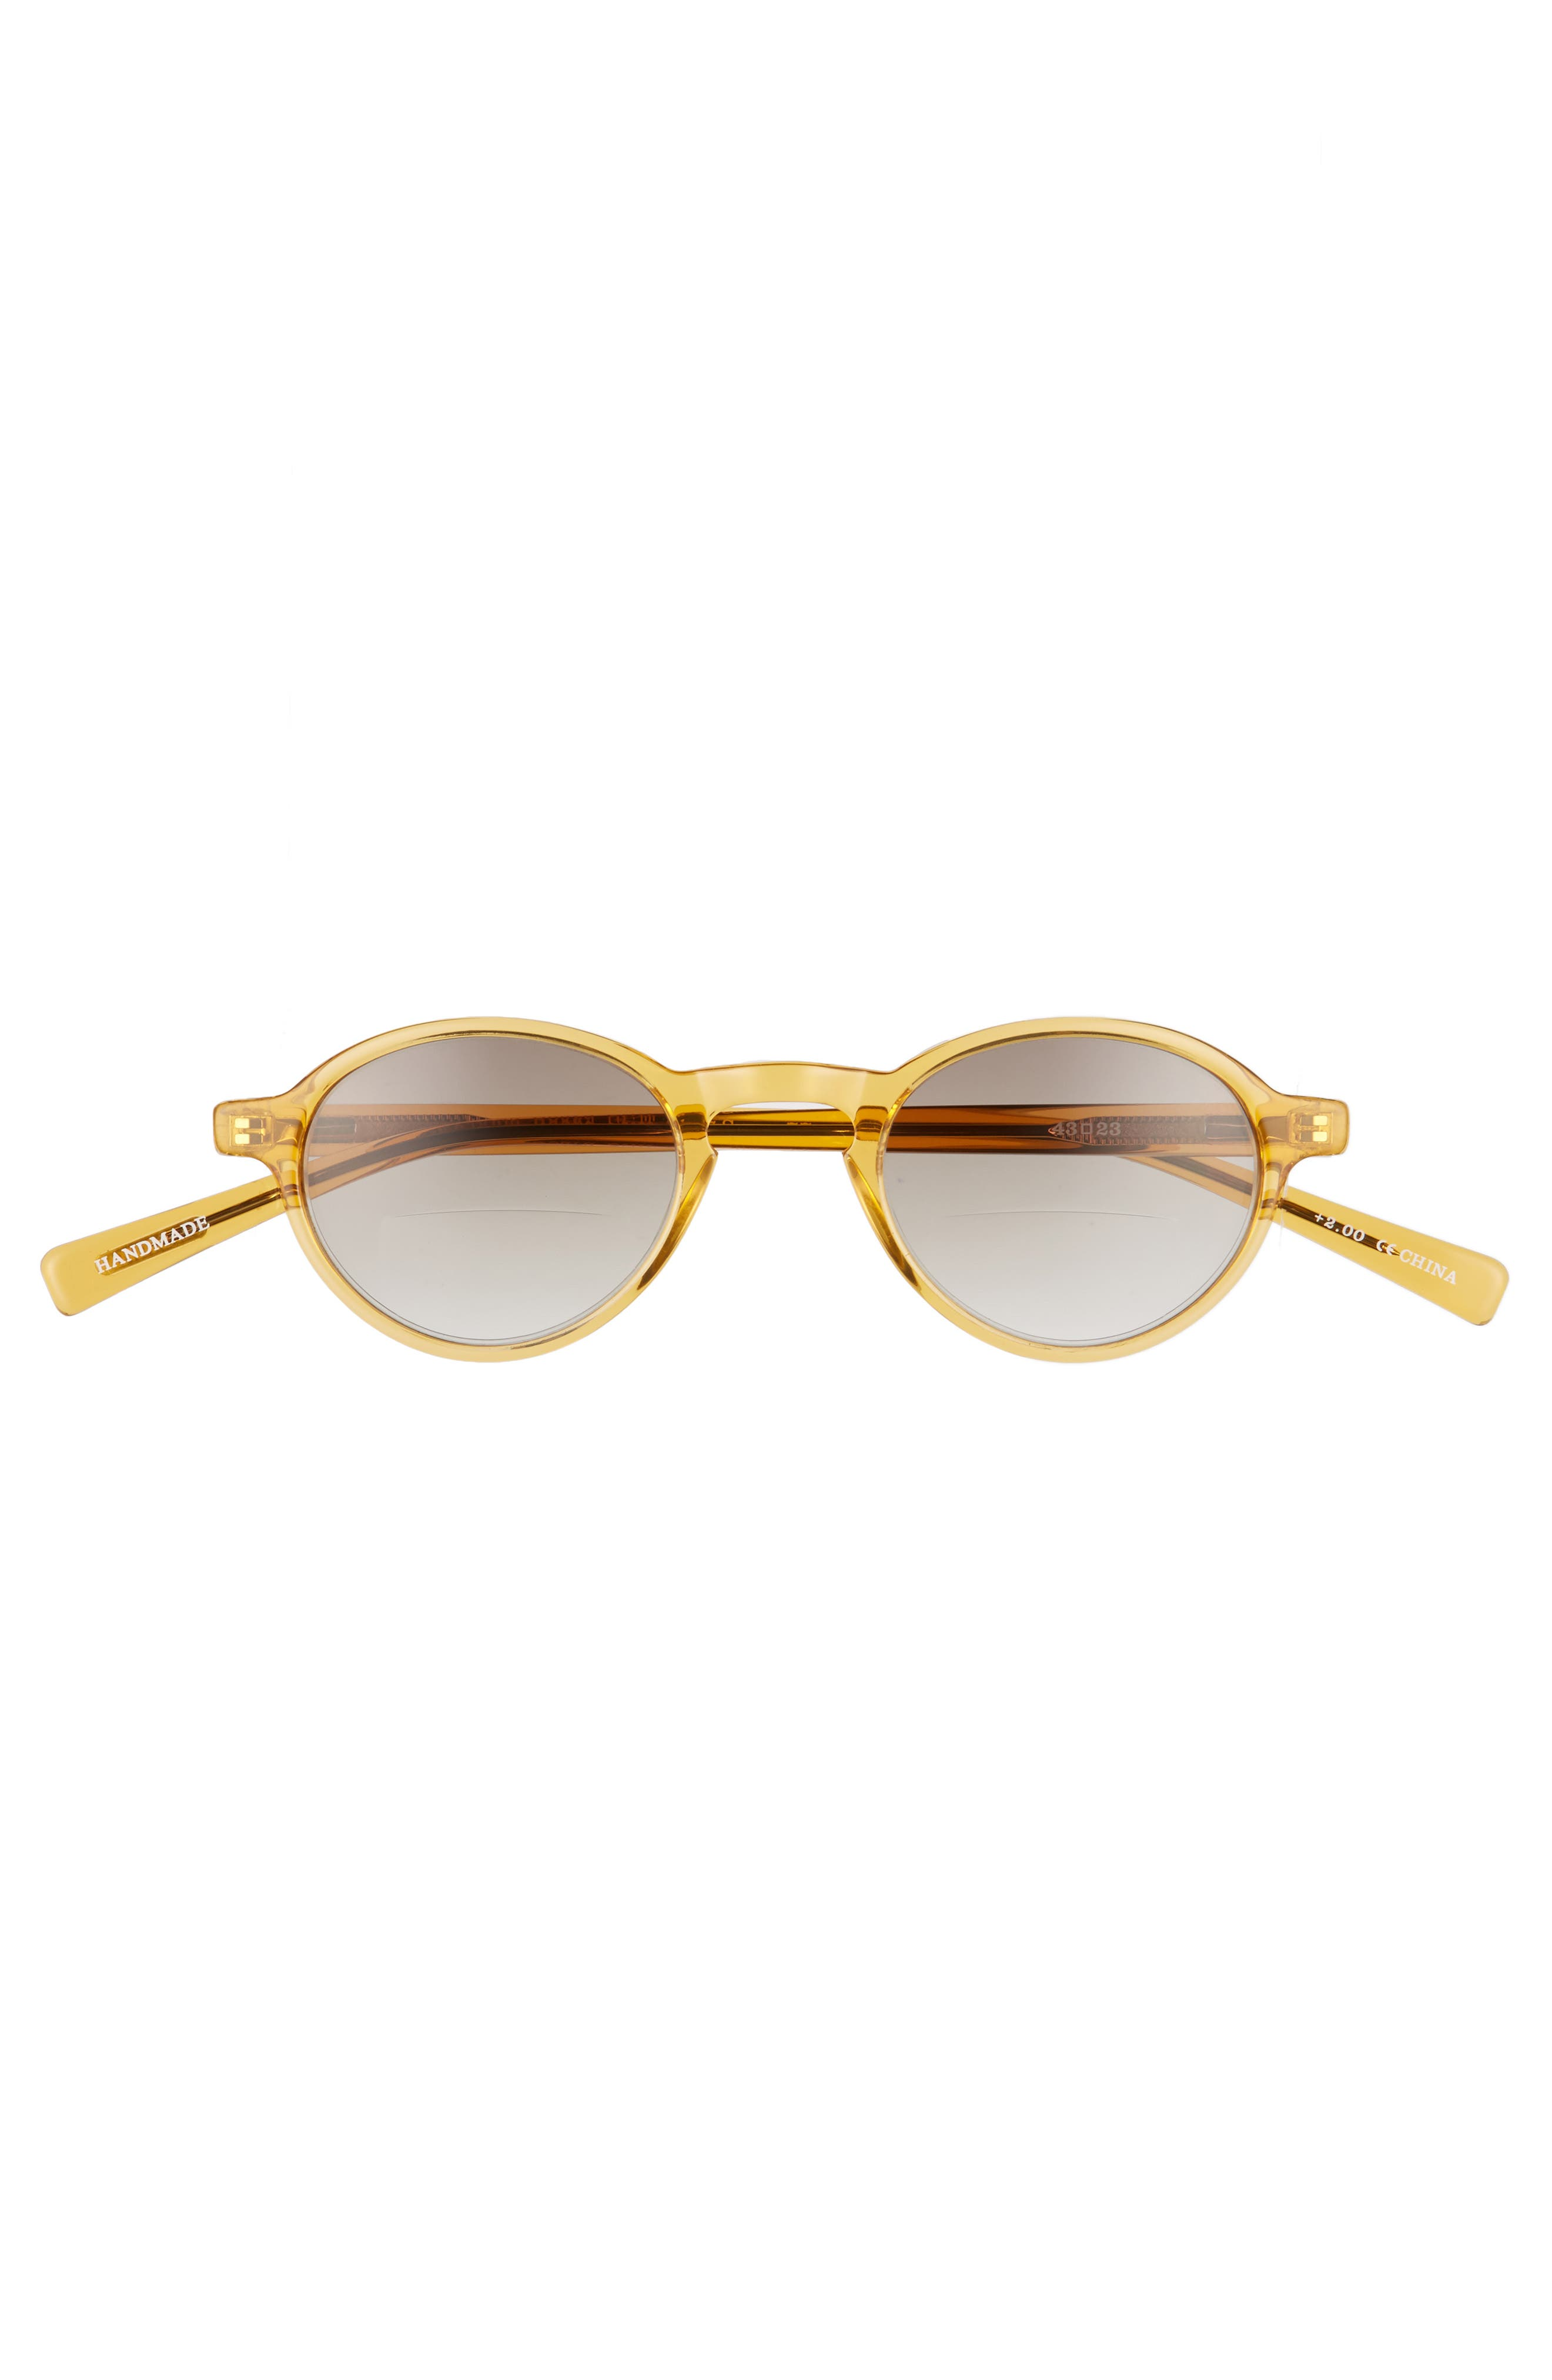 Board Stiff 43mm Reading Sunglasses,                             Alternate thumbnail 2, color,                             ORANGE CRYSTAL